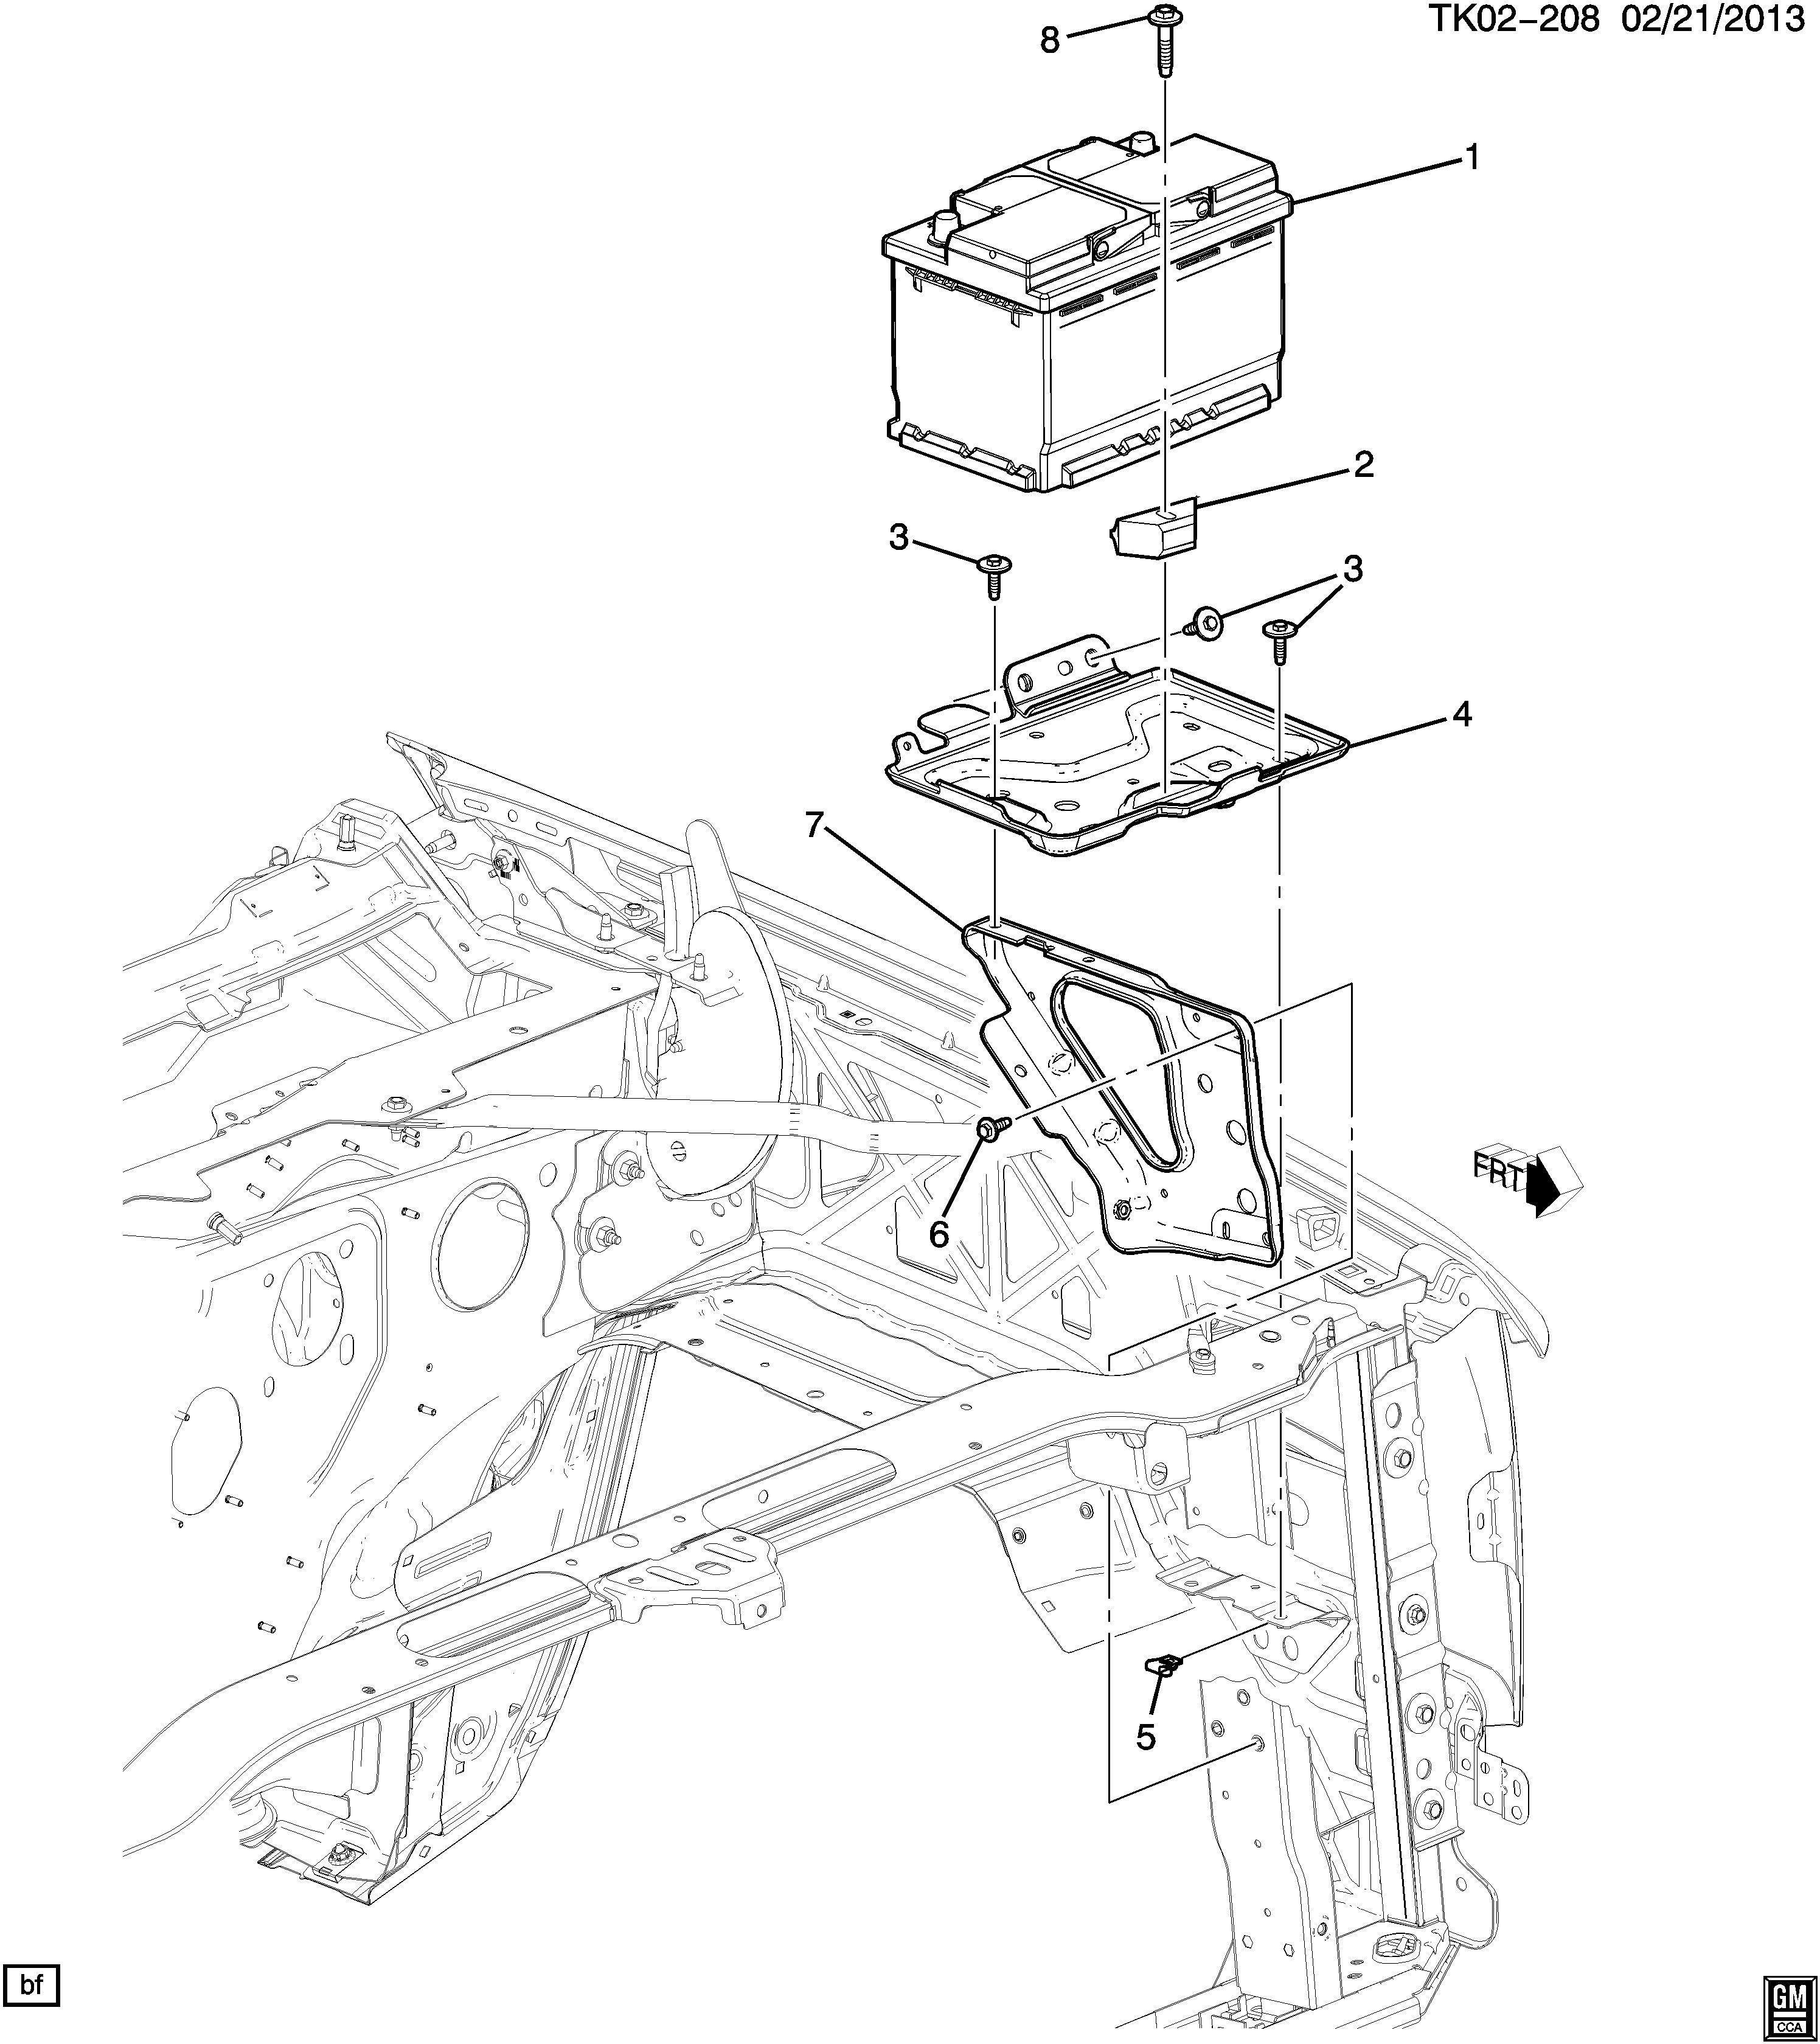 22989633 - chevrolet tray  battery  tray  body bat